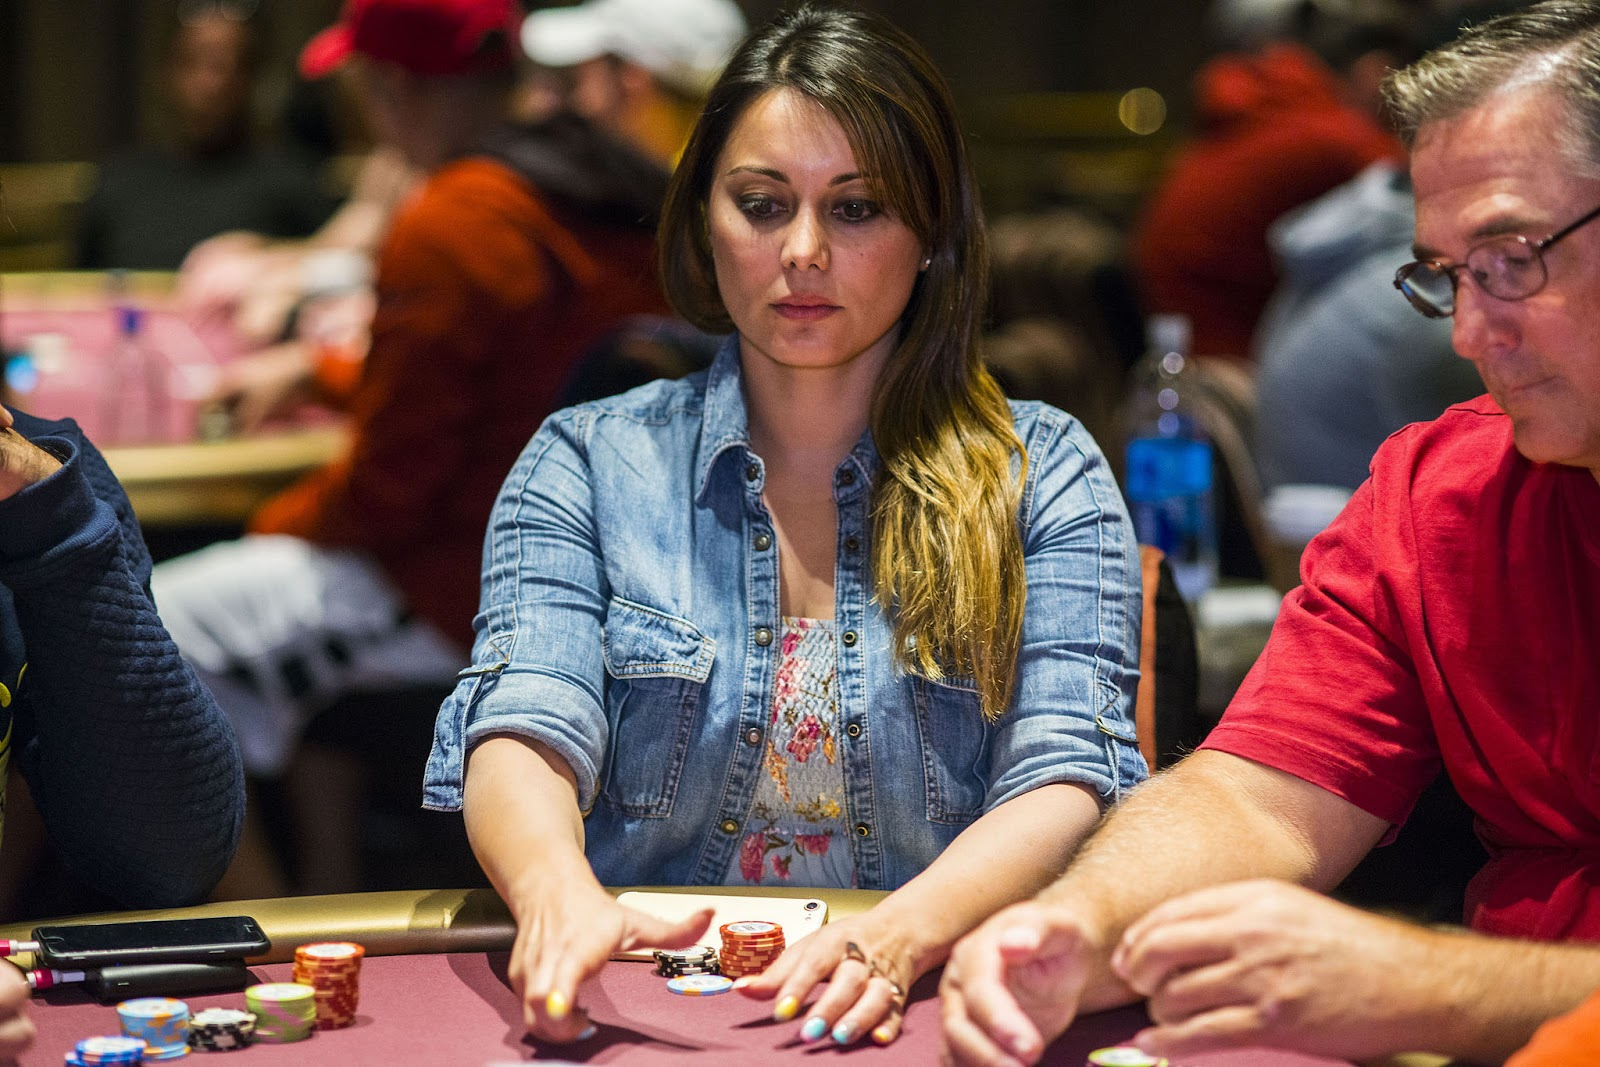 Minissha lamba - One of the poker queens of India